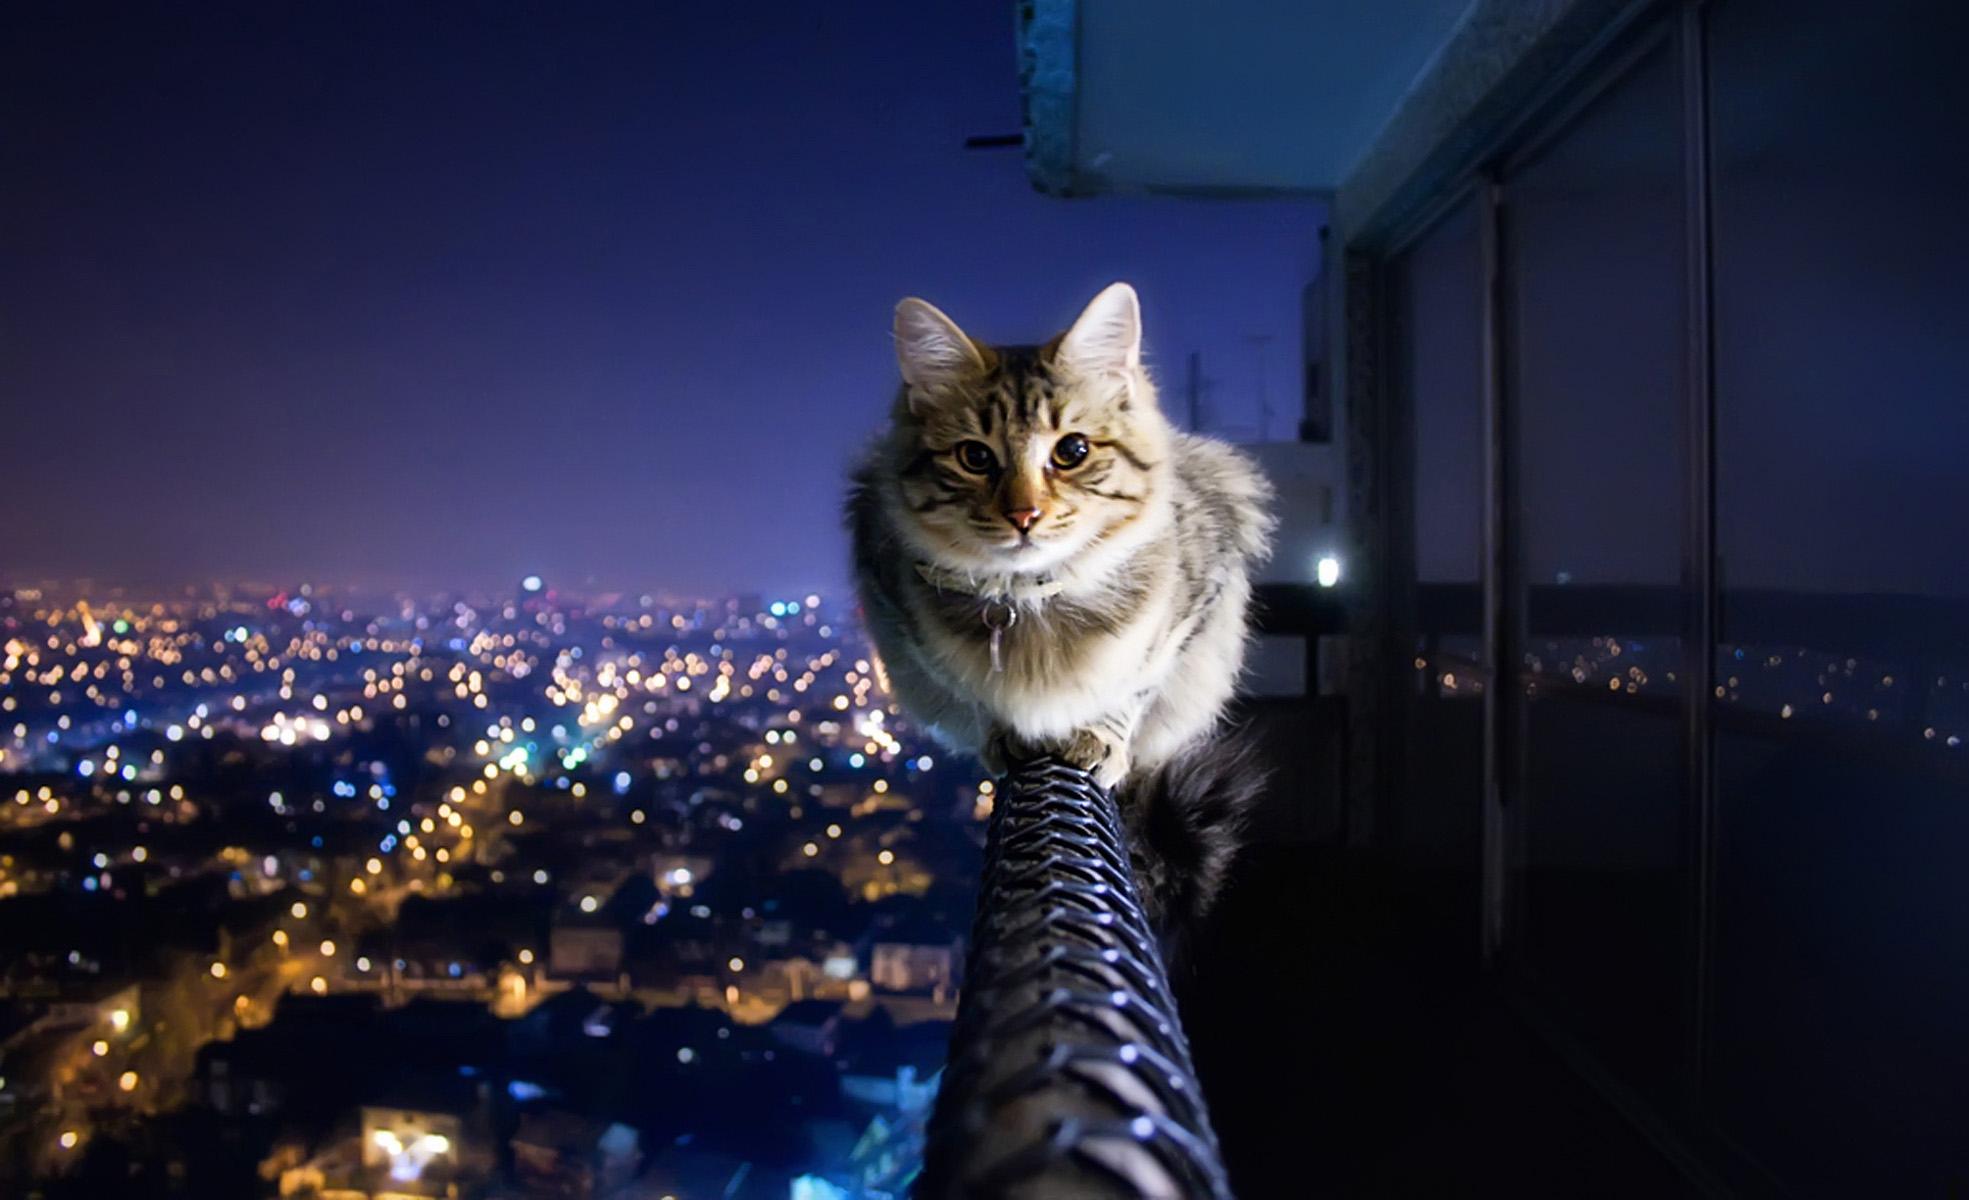 Hd wallpaper night - House Of Night Cats Wallpapers House Of Night Cats Backgrounds House